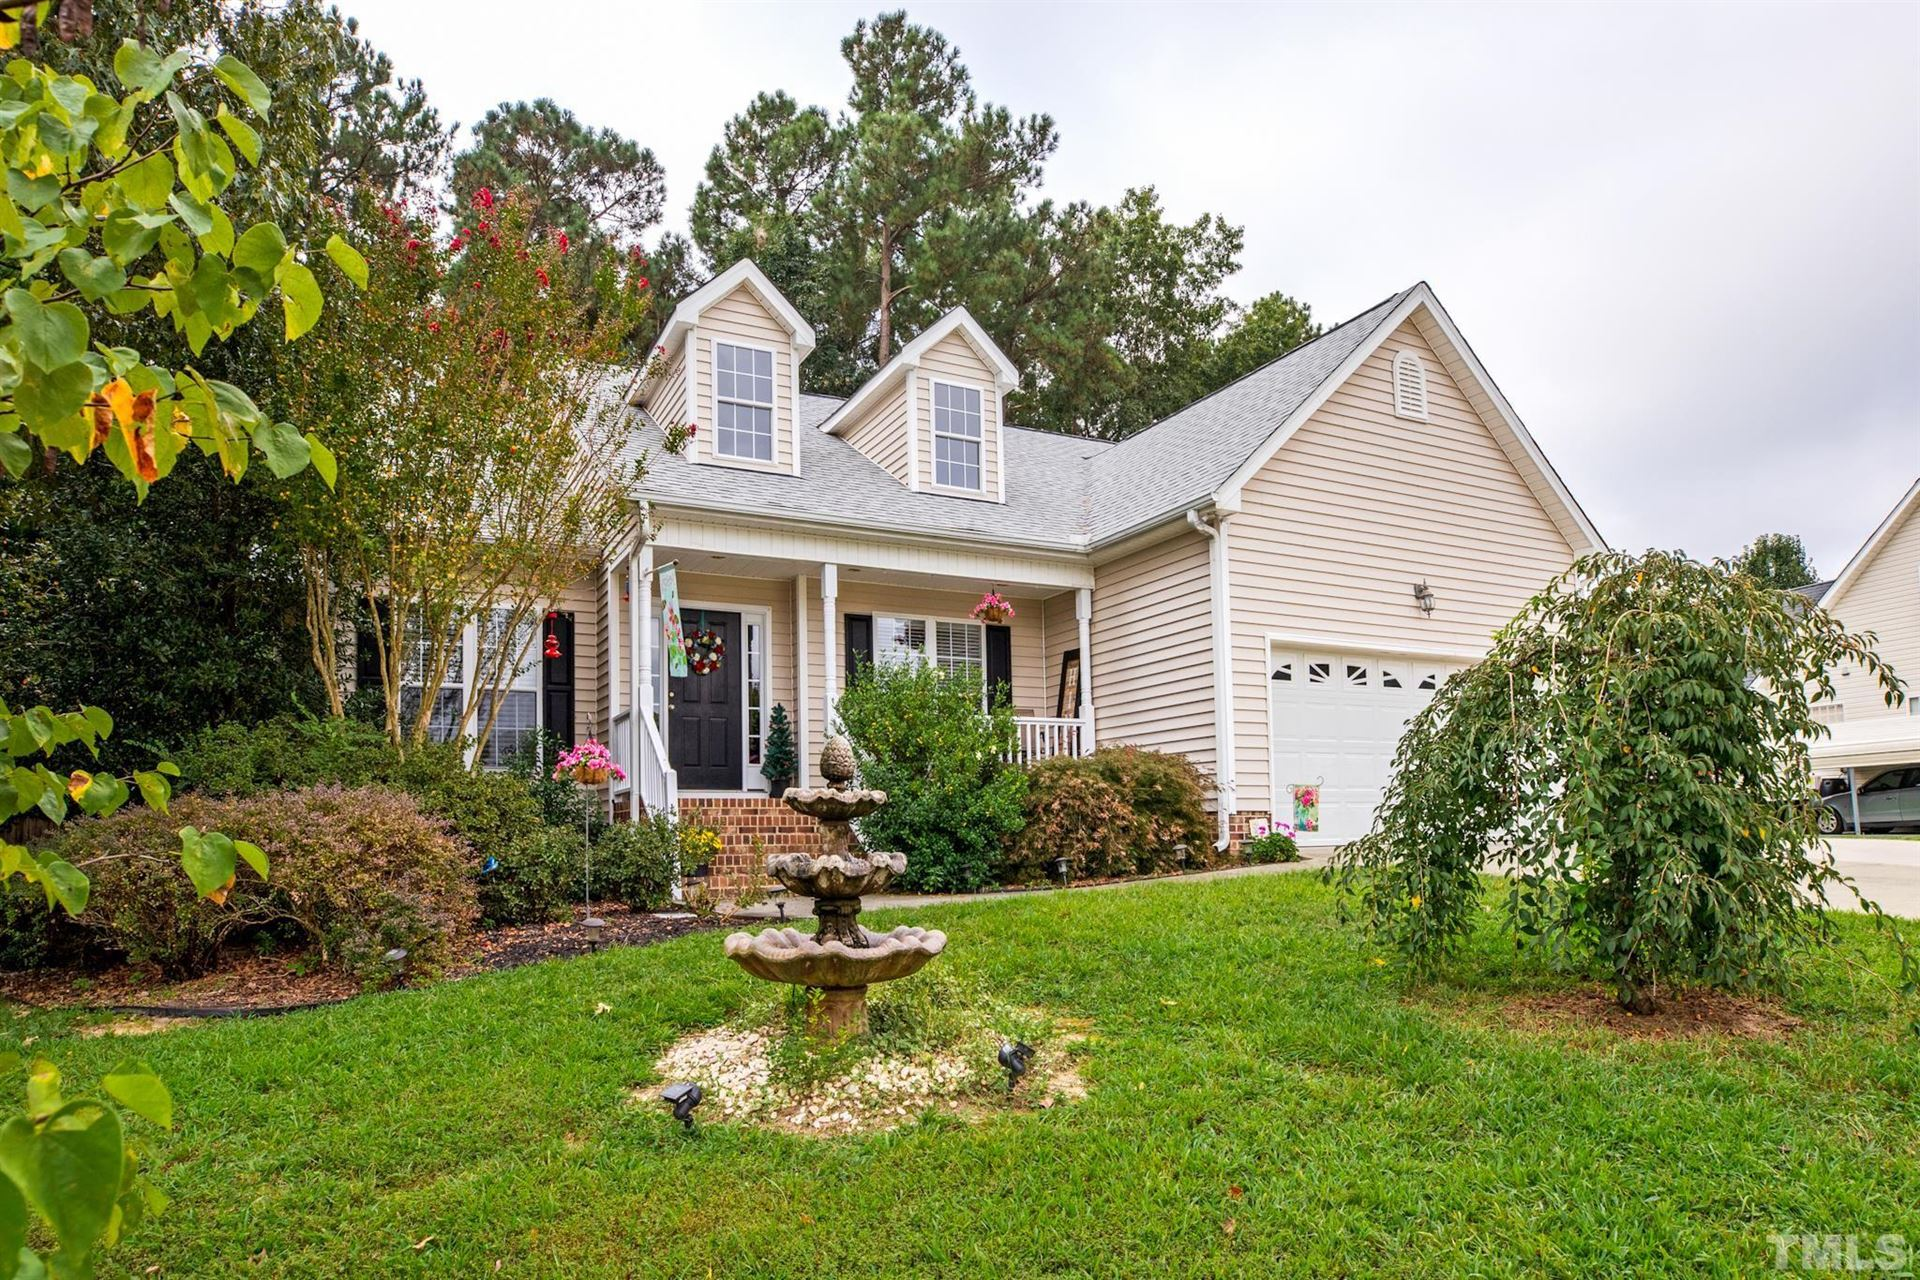 Photo of 593 Geneina Lane, Rolesville, NC 27571 (MLS # 2408642)